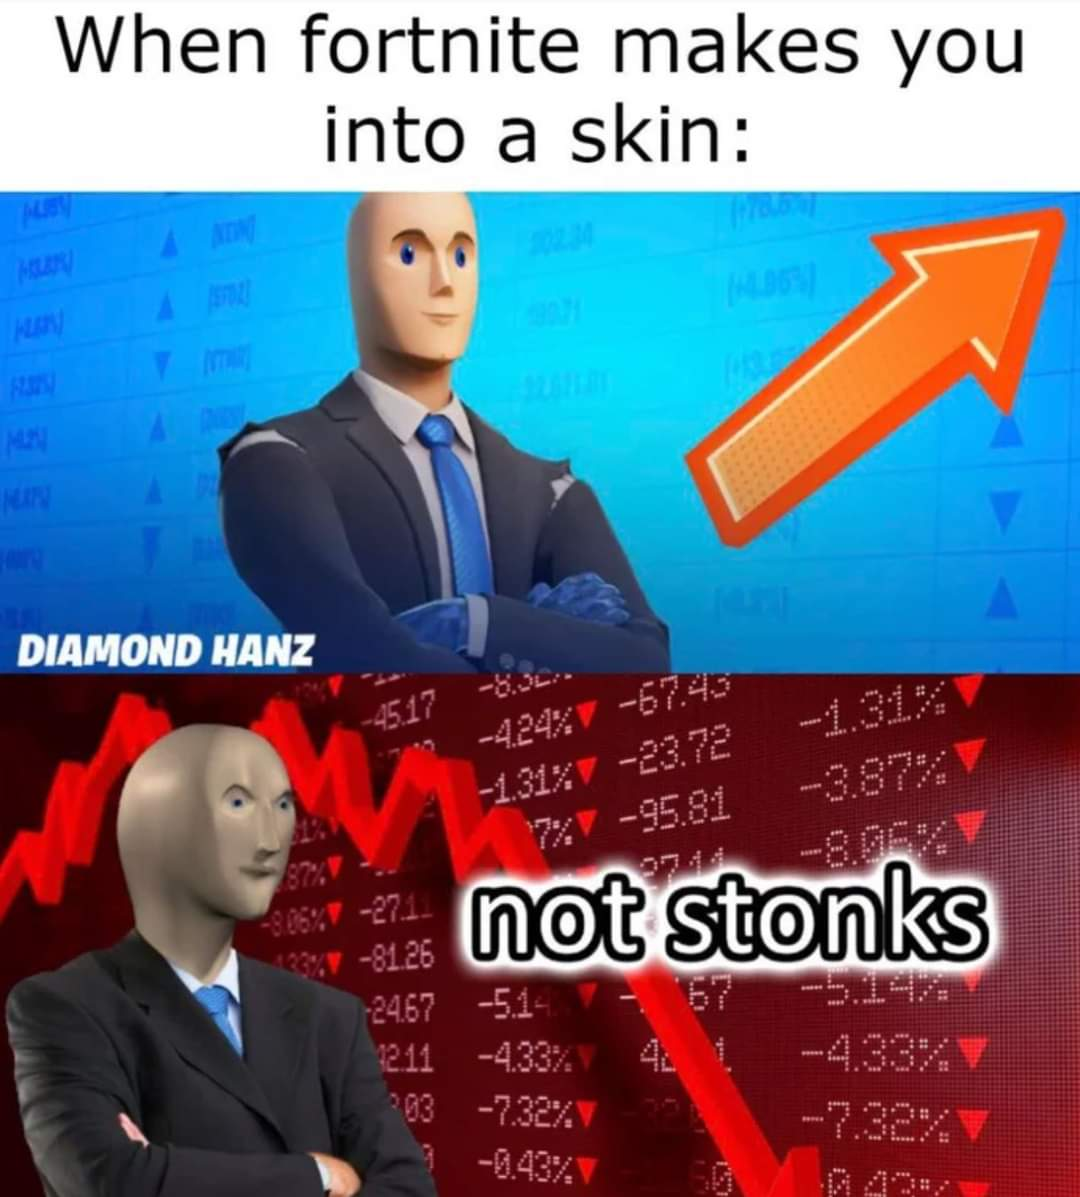 Memes Fortnite video game